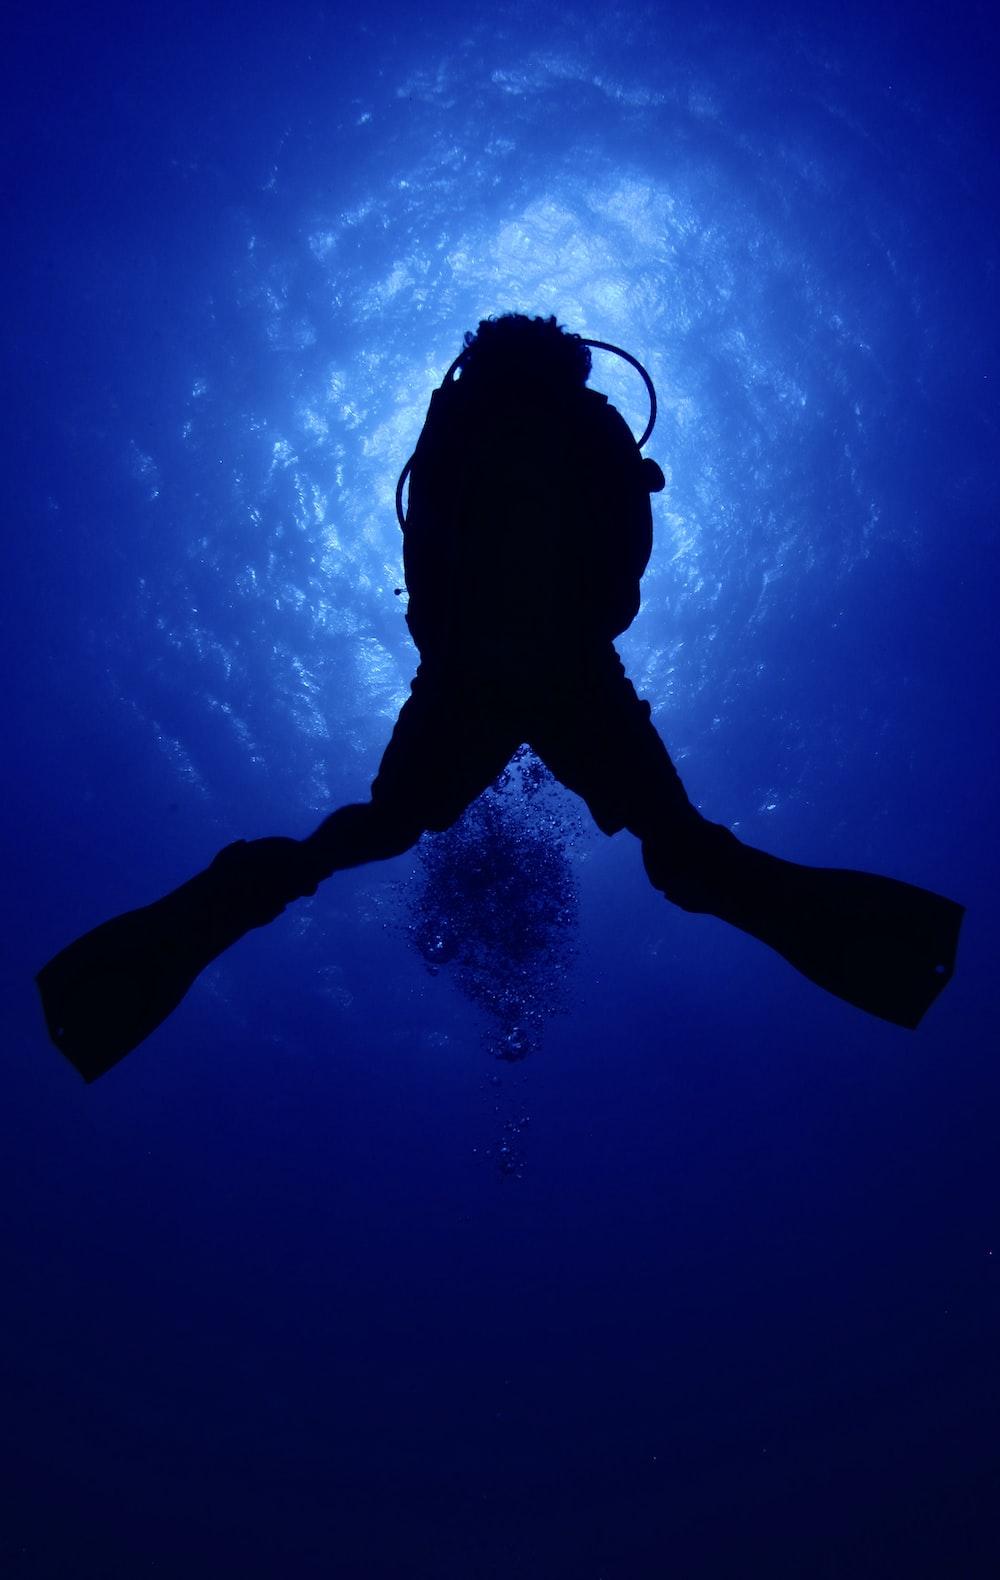 scuba diver in water